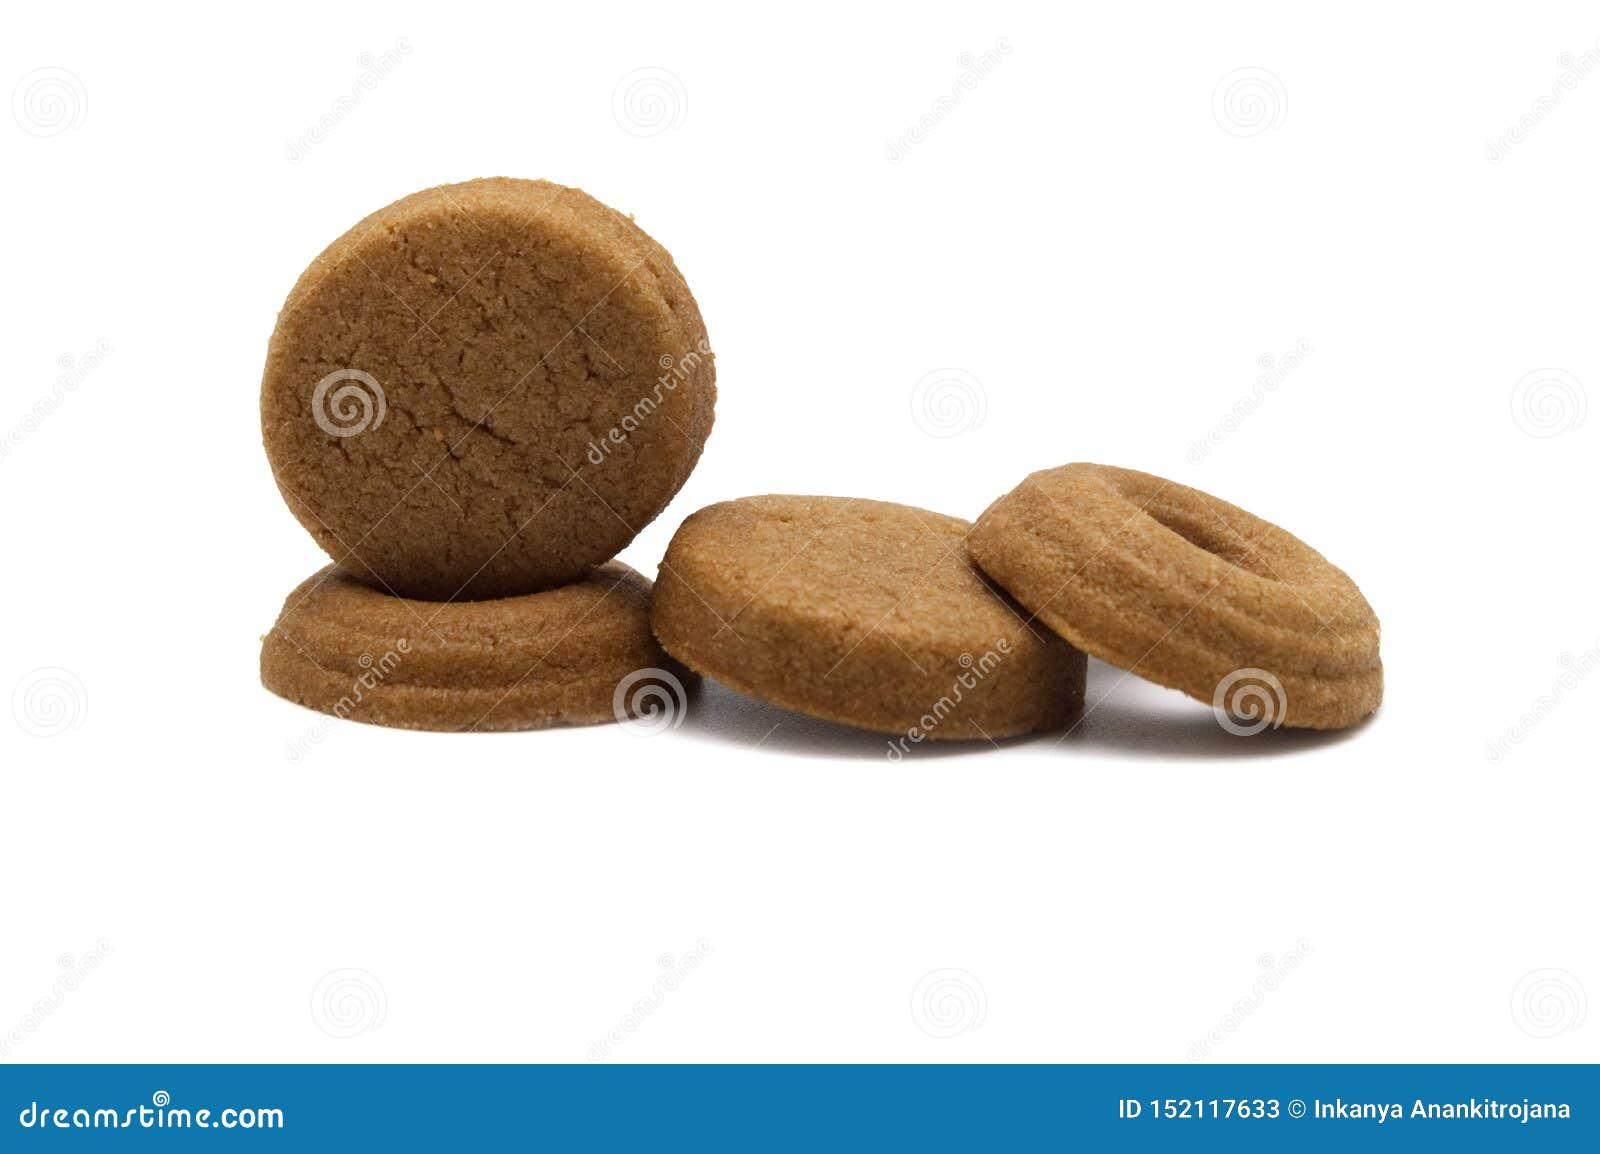 Mini cookies Chocolate malt flavored.